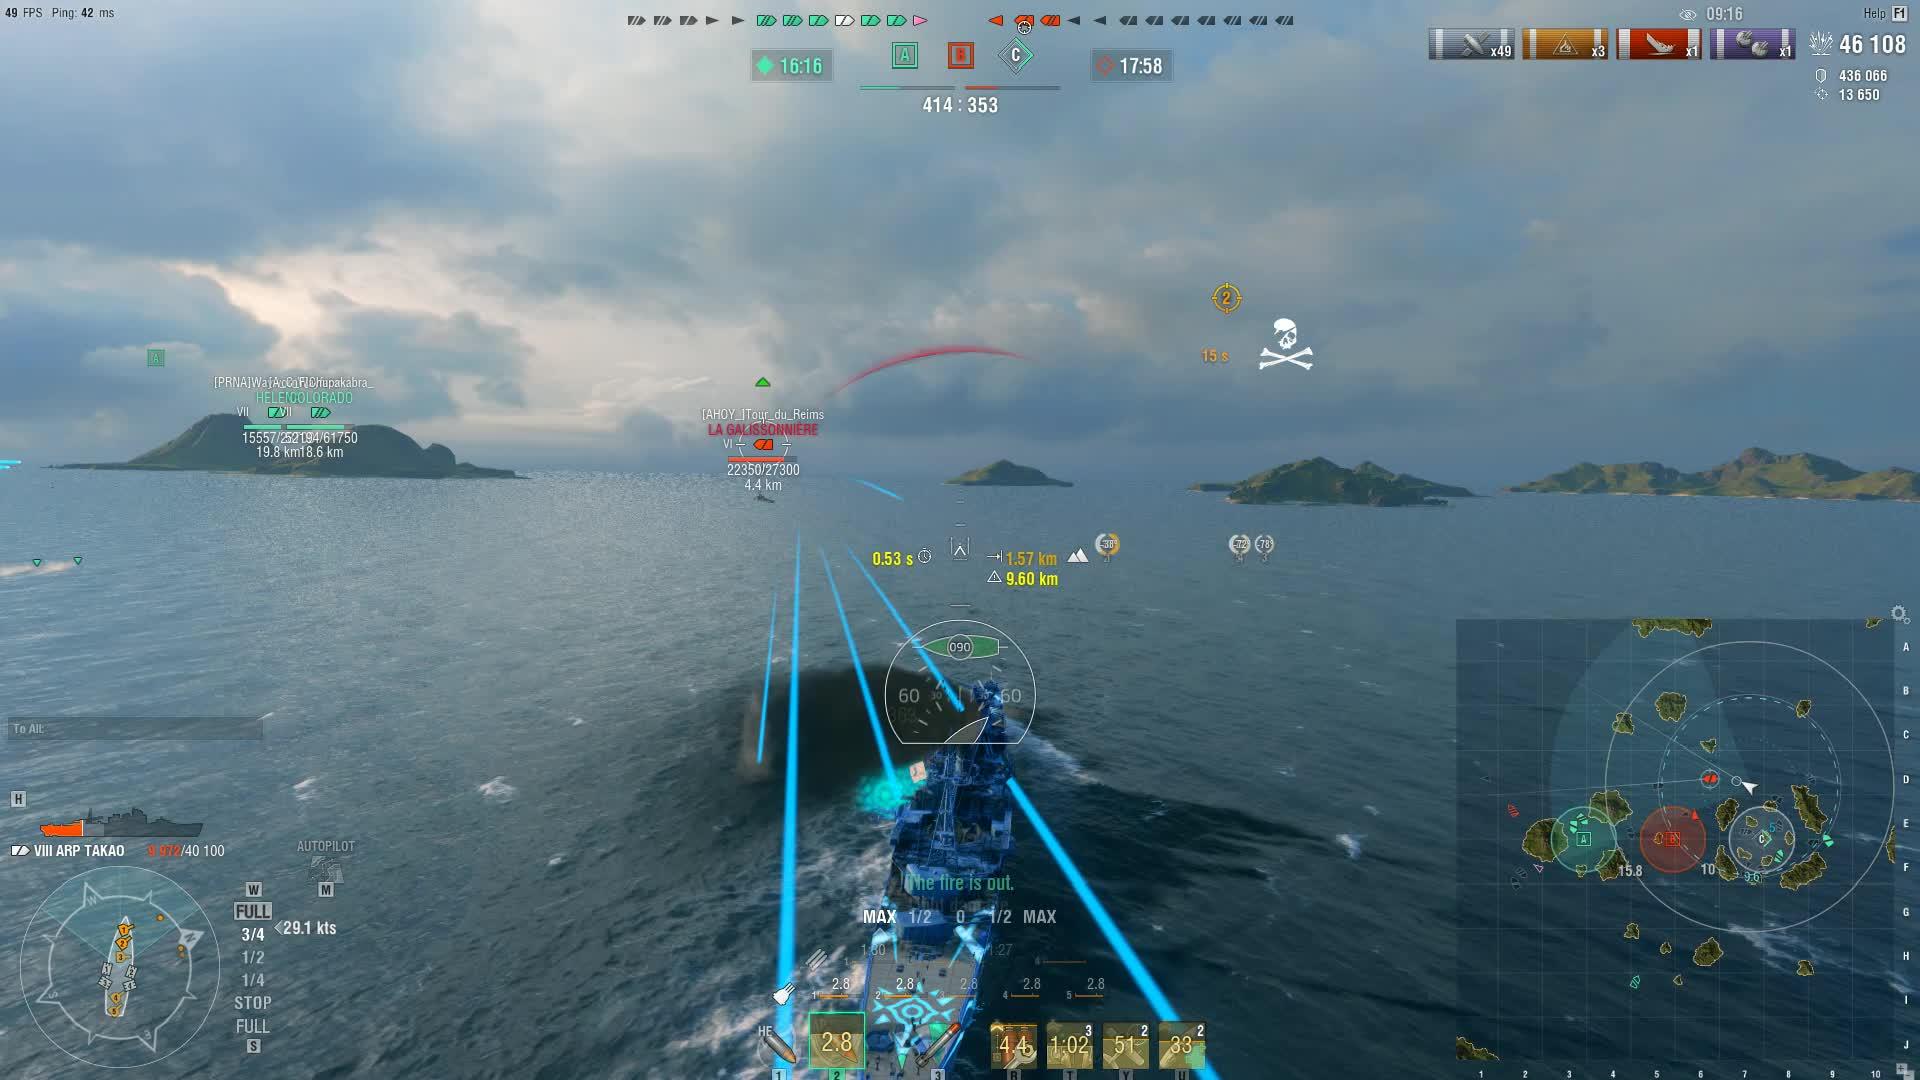 Takao, World of Warships, SURPRISE! CITADELS! GIFs